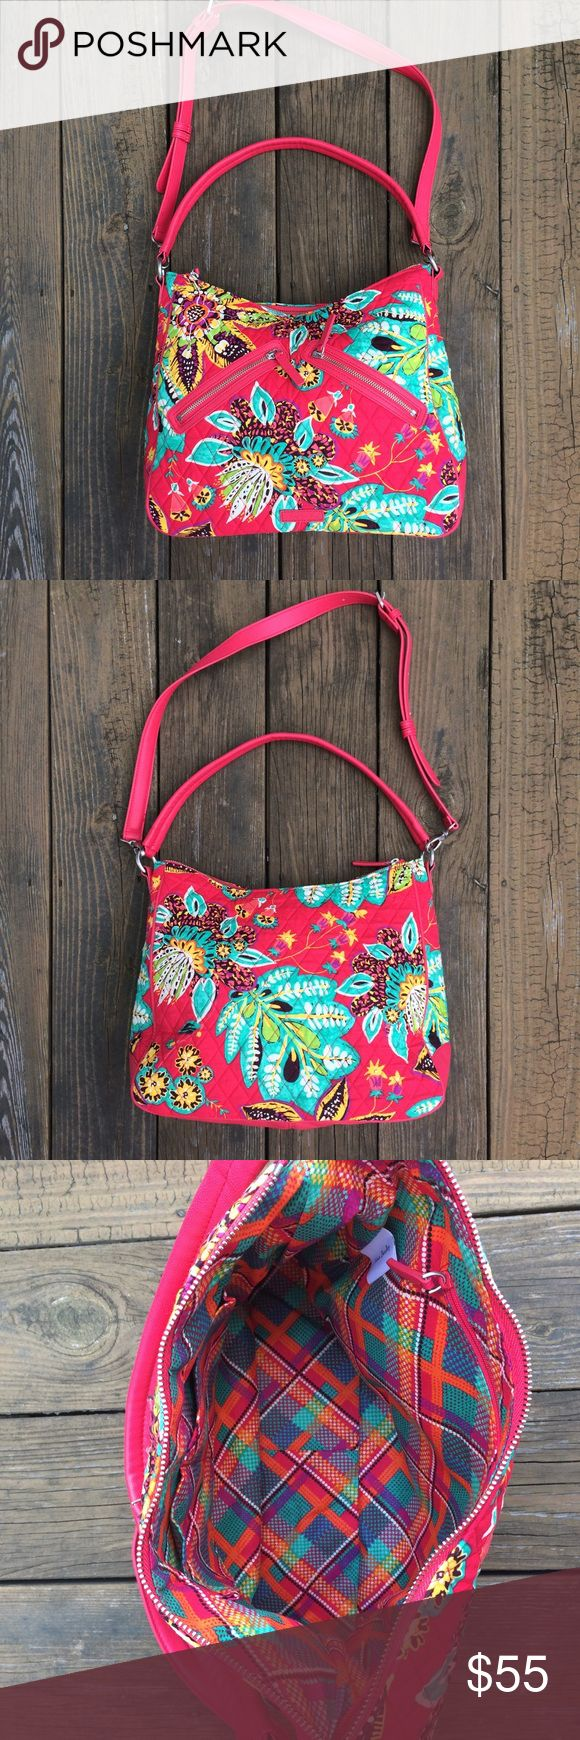 Selling this NWOT Pink Vera Bradley Vivian Signature Hobo Bag on Poshmark! My username is: ksreeder. #shopmycloset #poshmark #fashion #shopping #style #forsale #Vera Bradley #Handbags